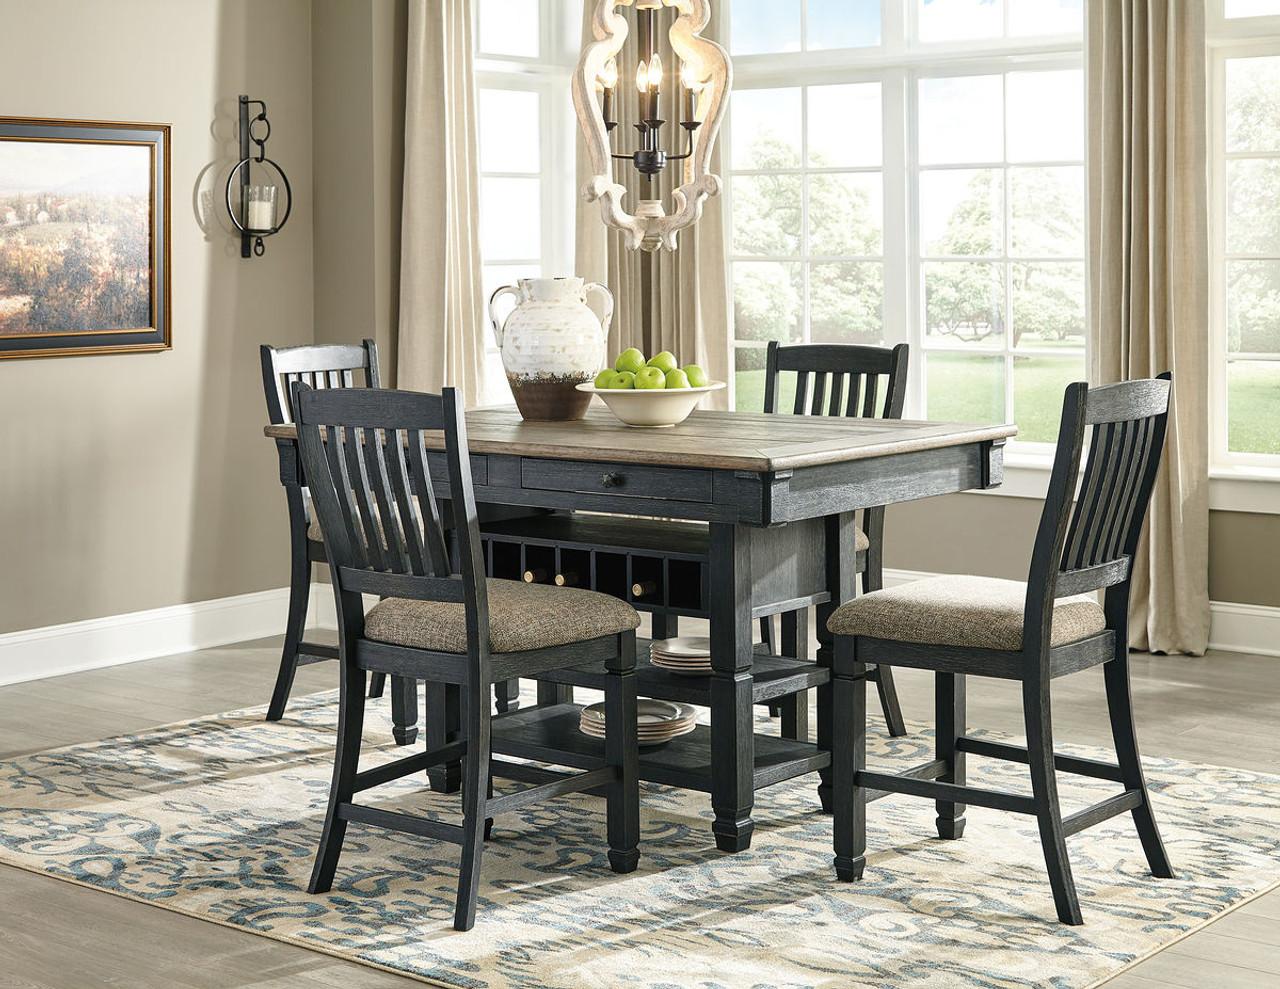 Phenomenal Tyler Creek Black Gray 5 Pc Rectangular Counter Height Dining Set Pdpeps Interior Chair Design Pdpepsorg